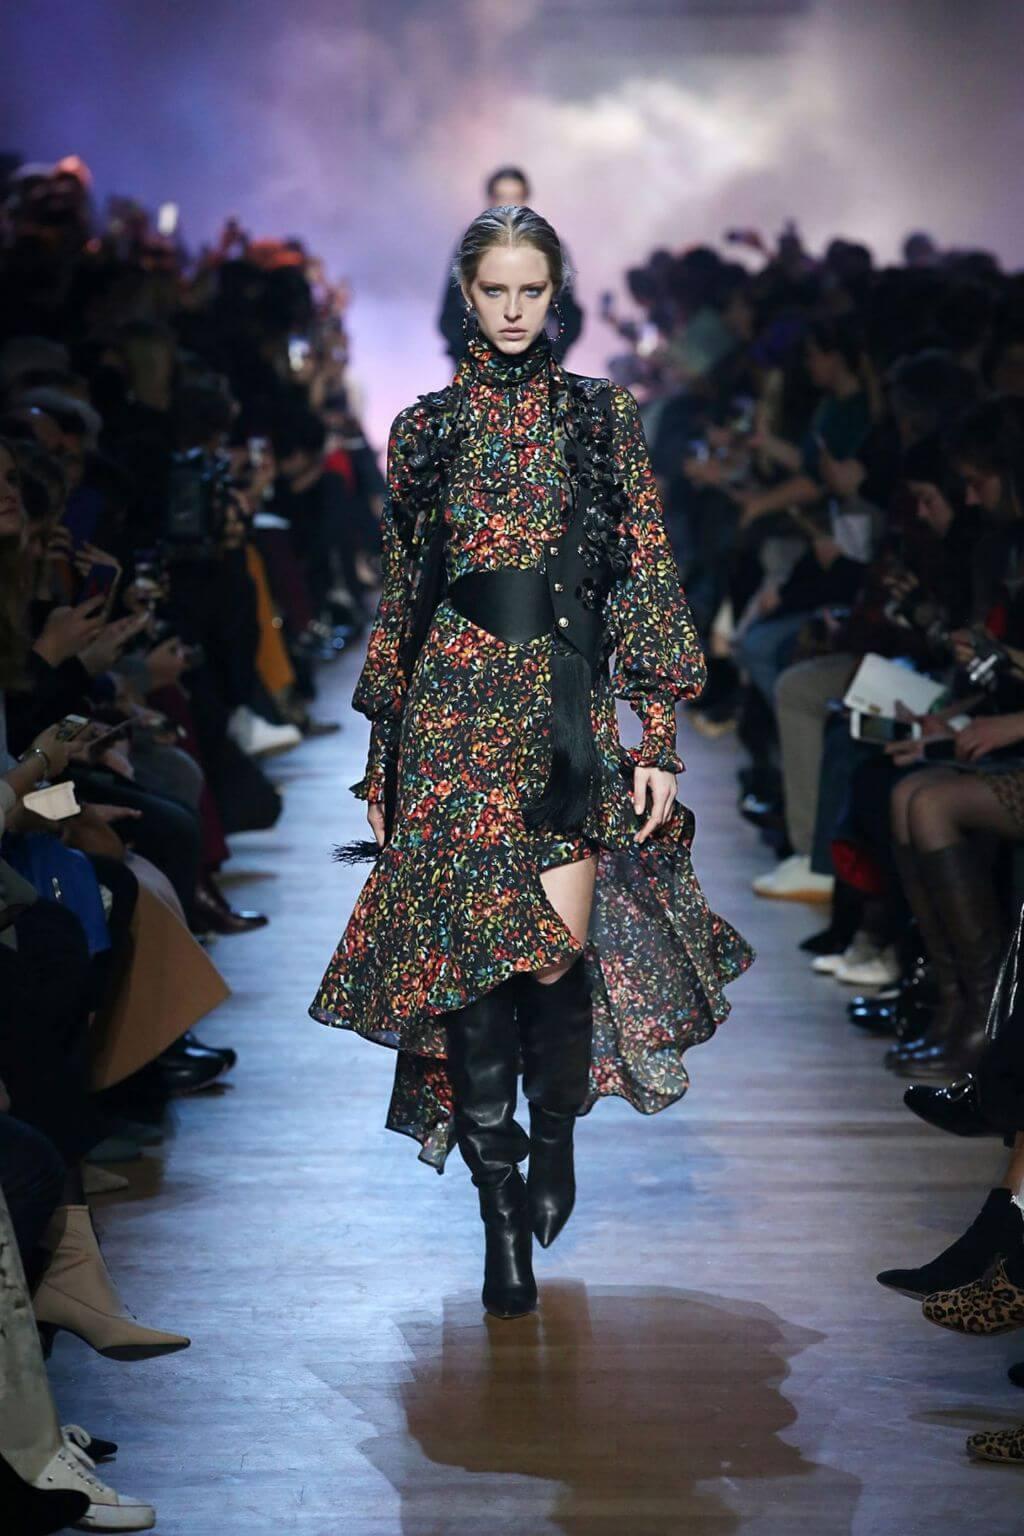 Elie Saab Ready To Wear Autumn Winter 2018 2019 Look 1